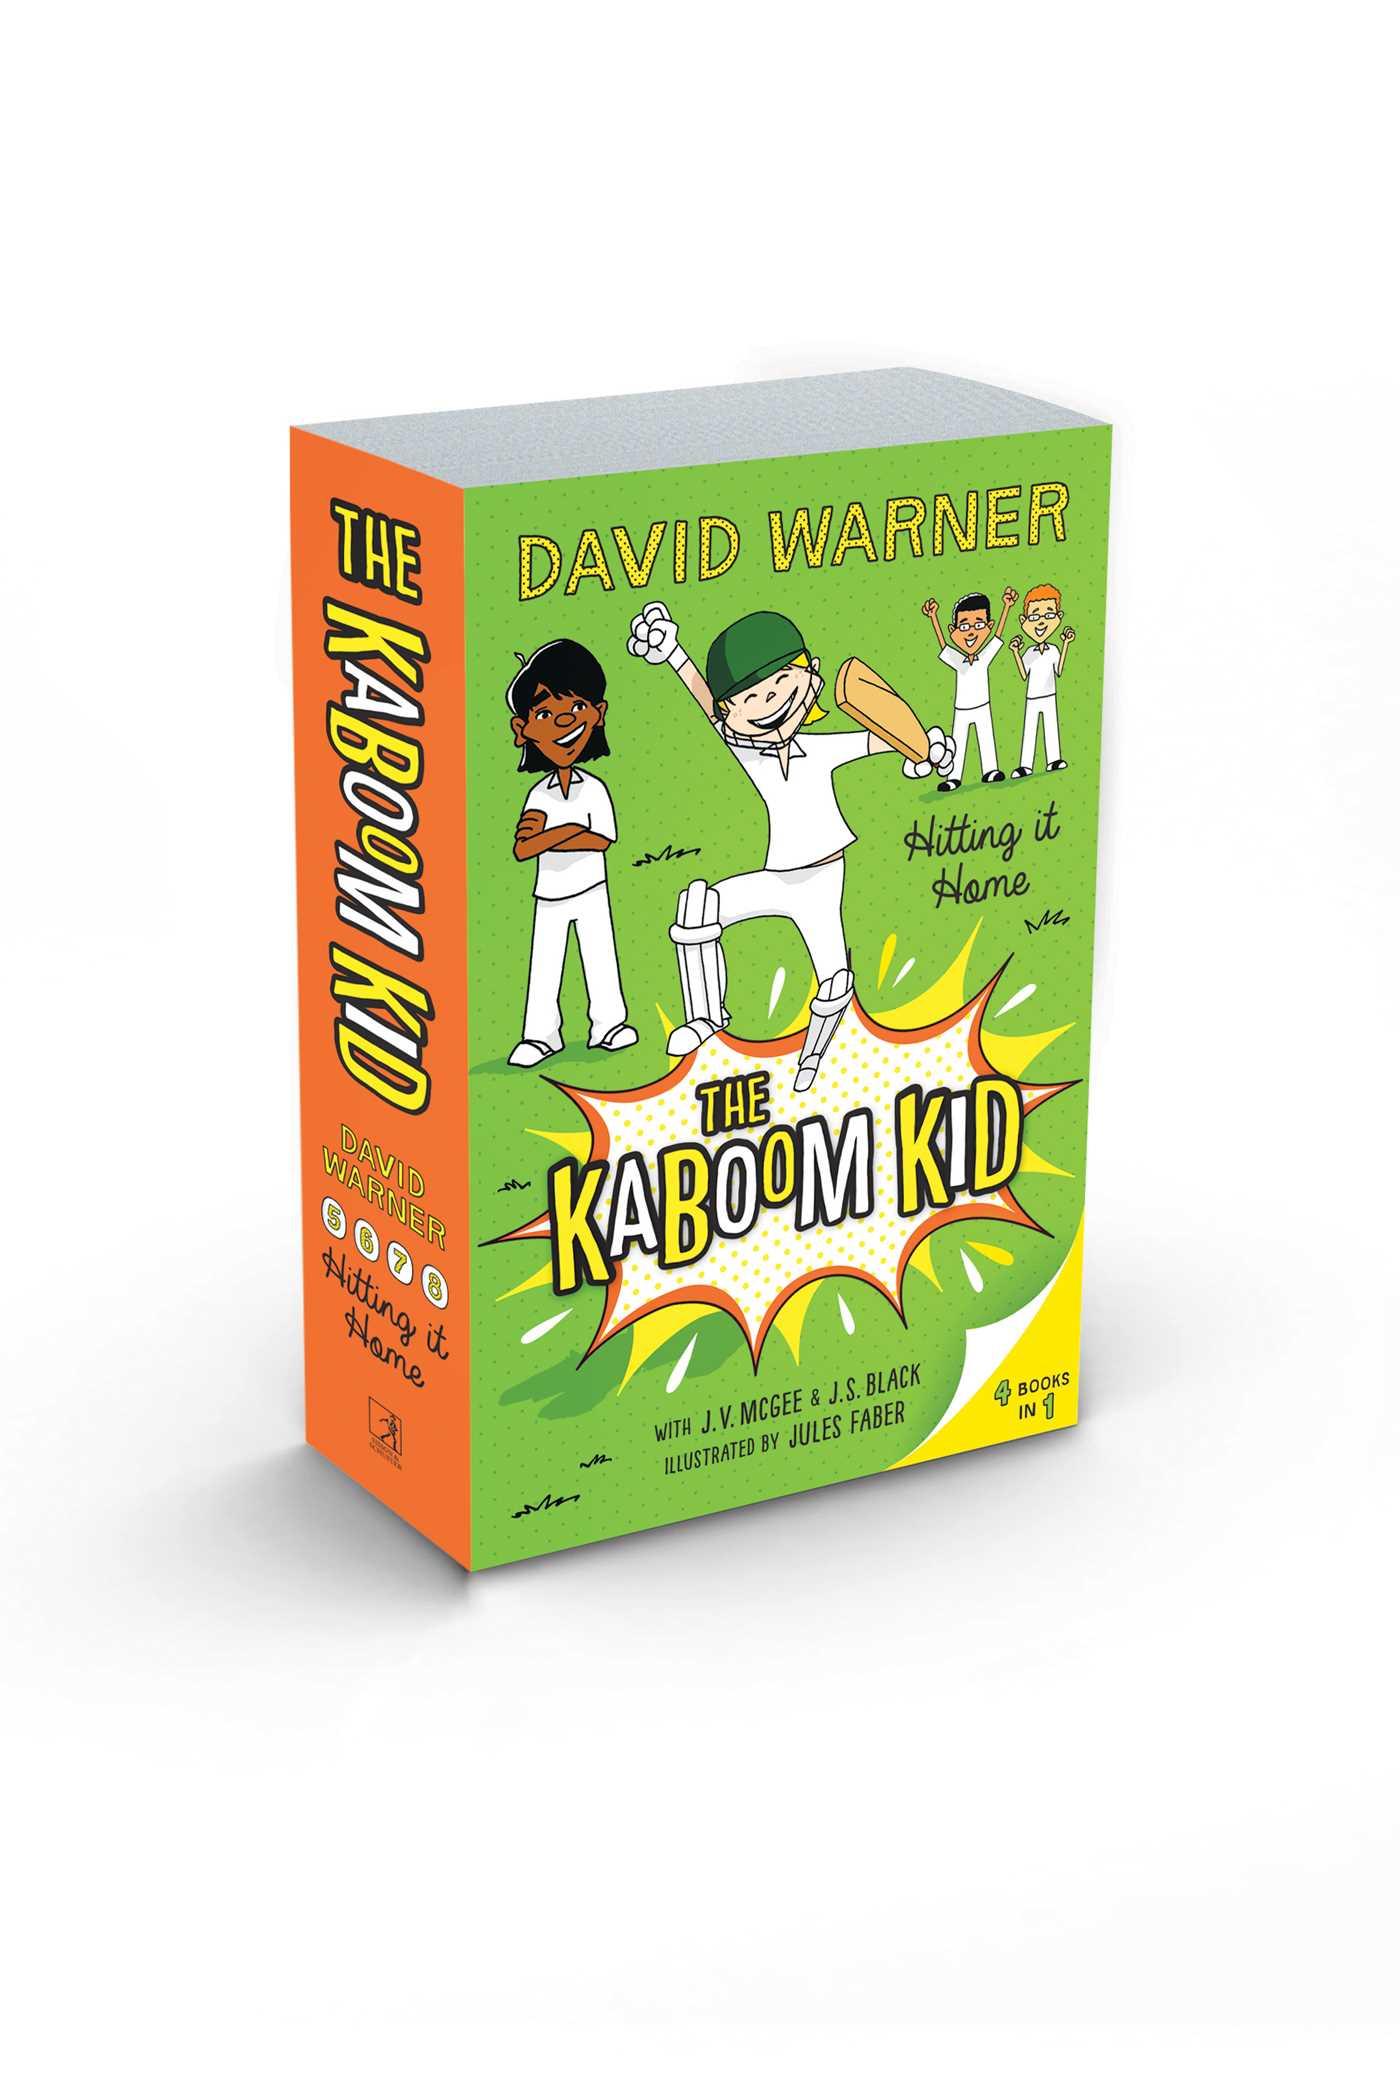 Hitting it home the kaboom kid books 5 8 9781925596502 hr